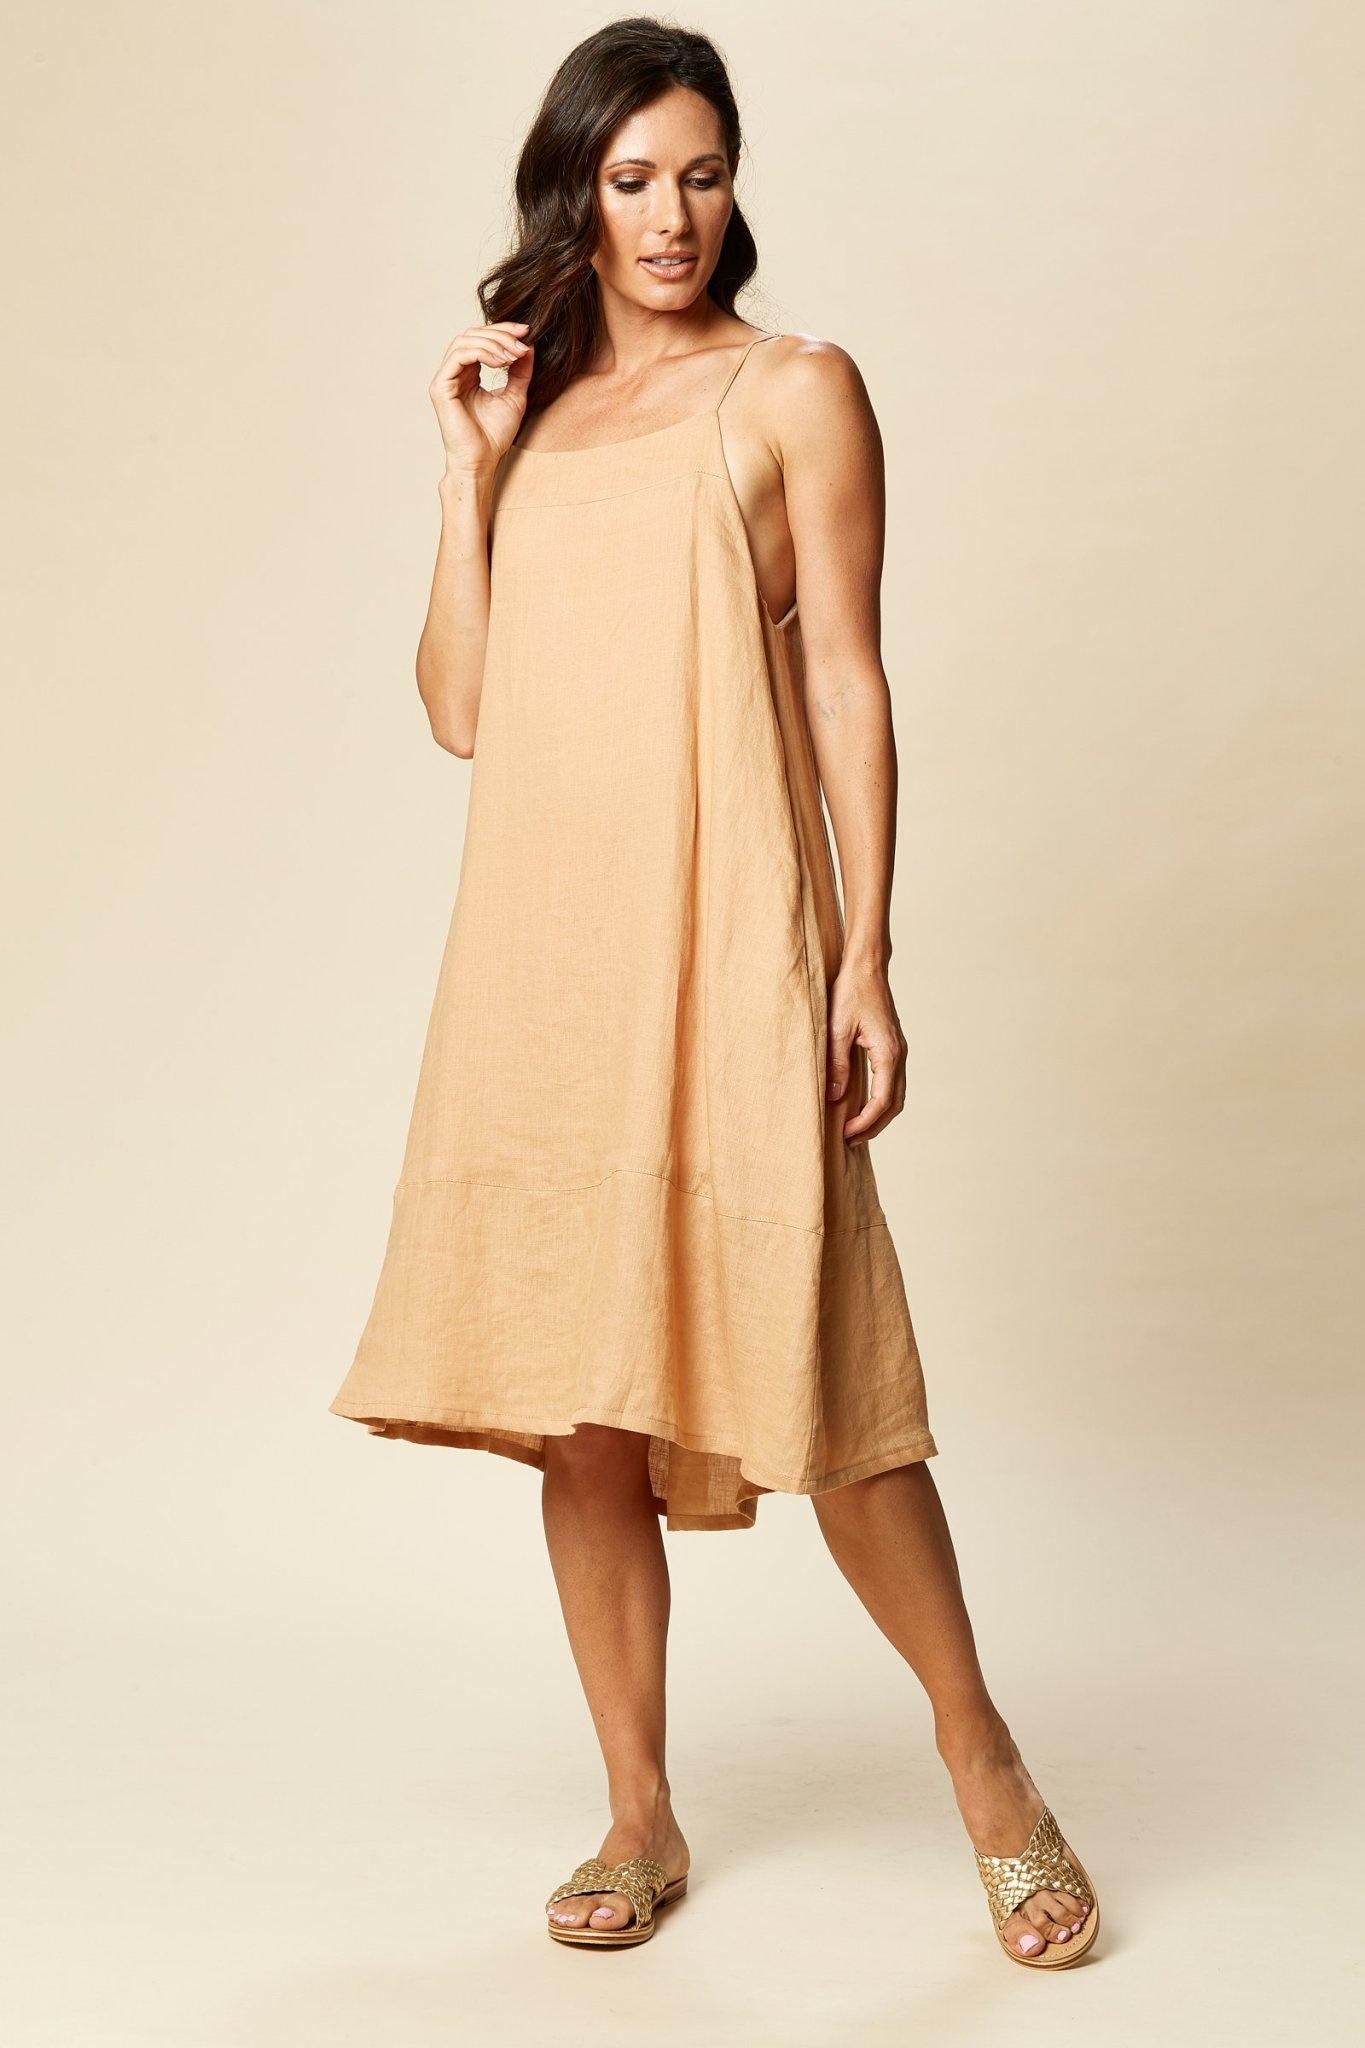 Eb & Ive Tribu Dress